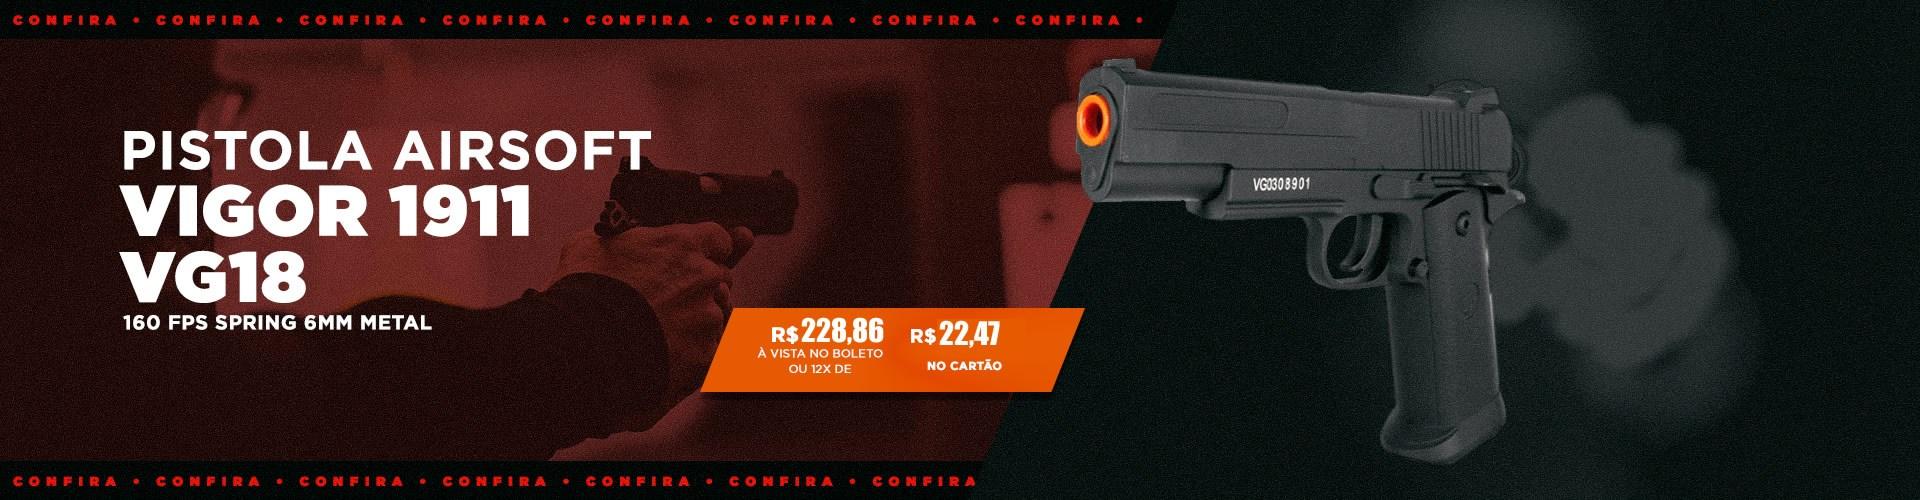 Pistola Airsoft Vigor Metal 1911 VG18 160 FPS Spring 6mm